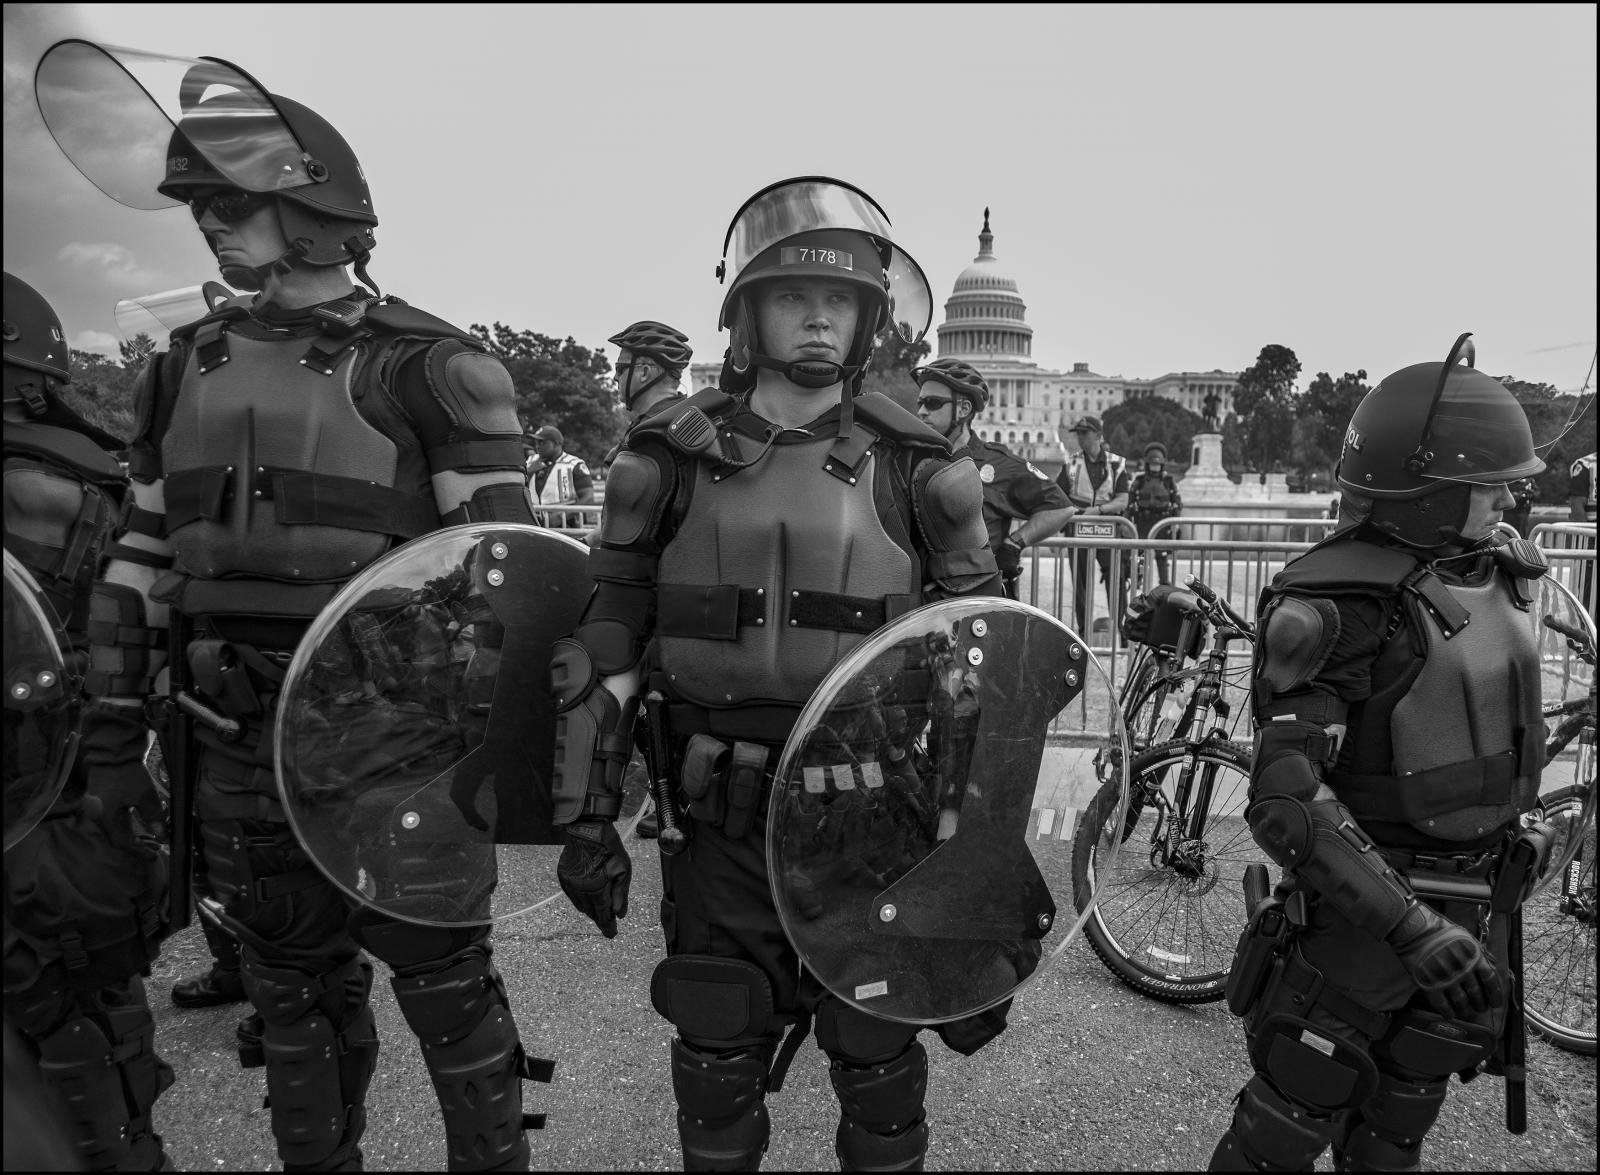 Photography image - Loading __Riot_police.Capitol.v1.jpg